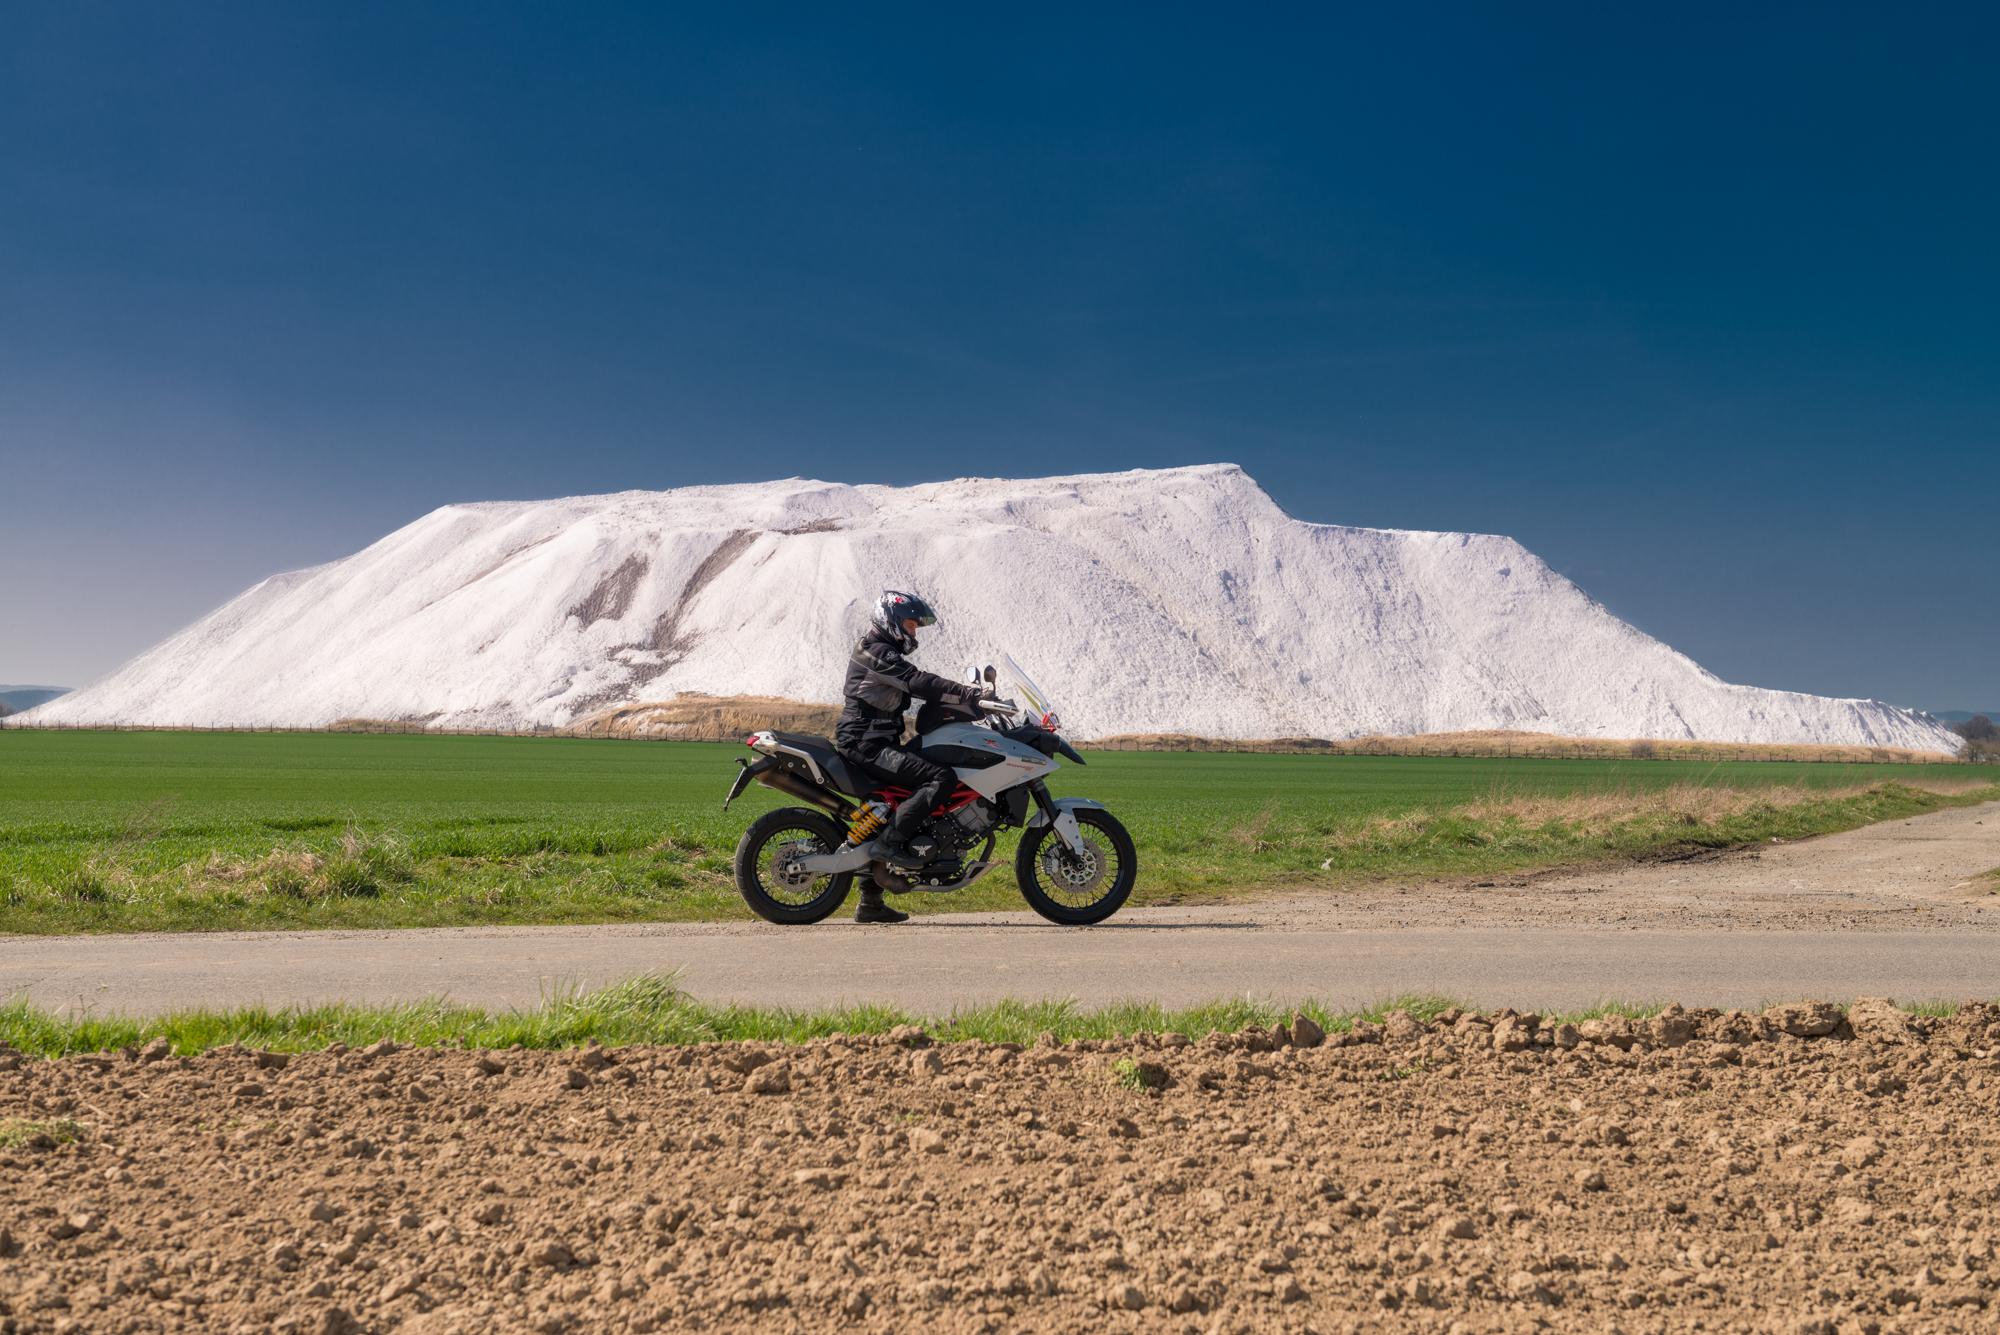 Short bike shoot at a potash mine heap